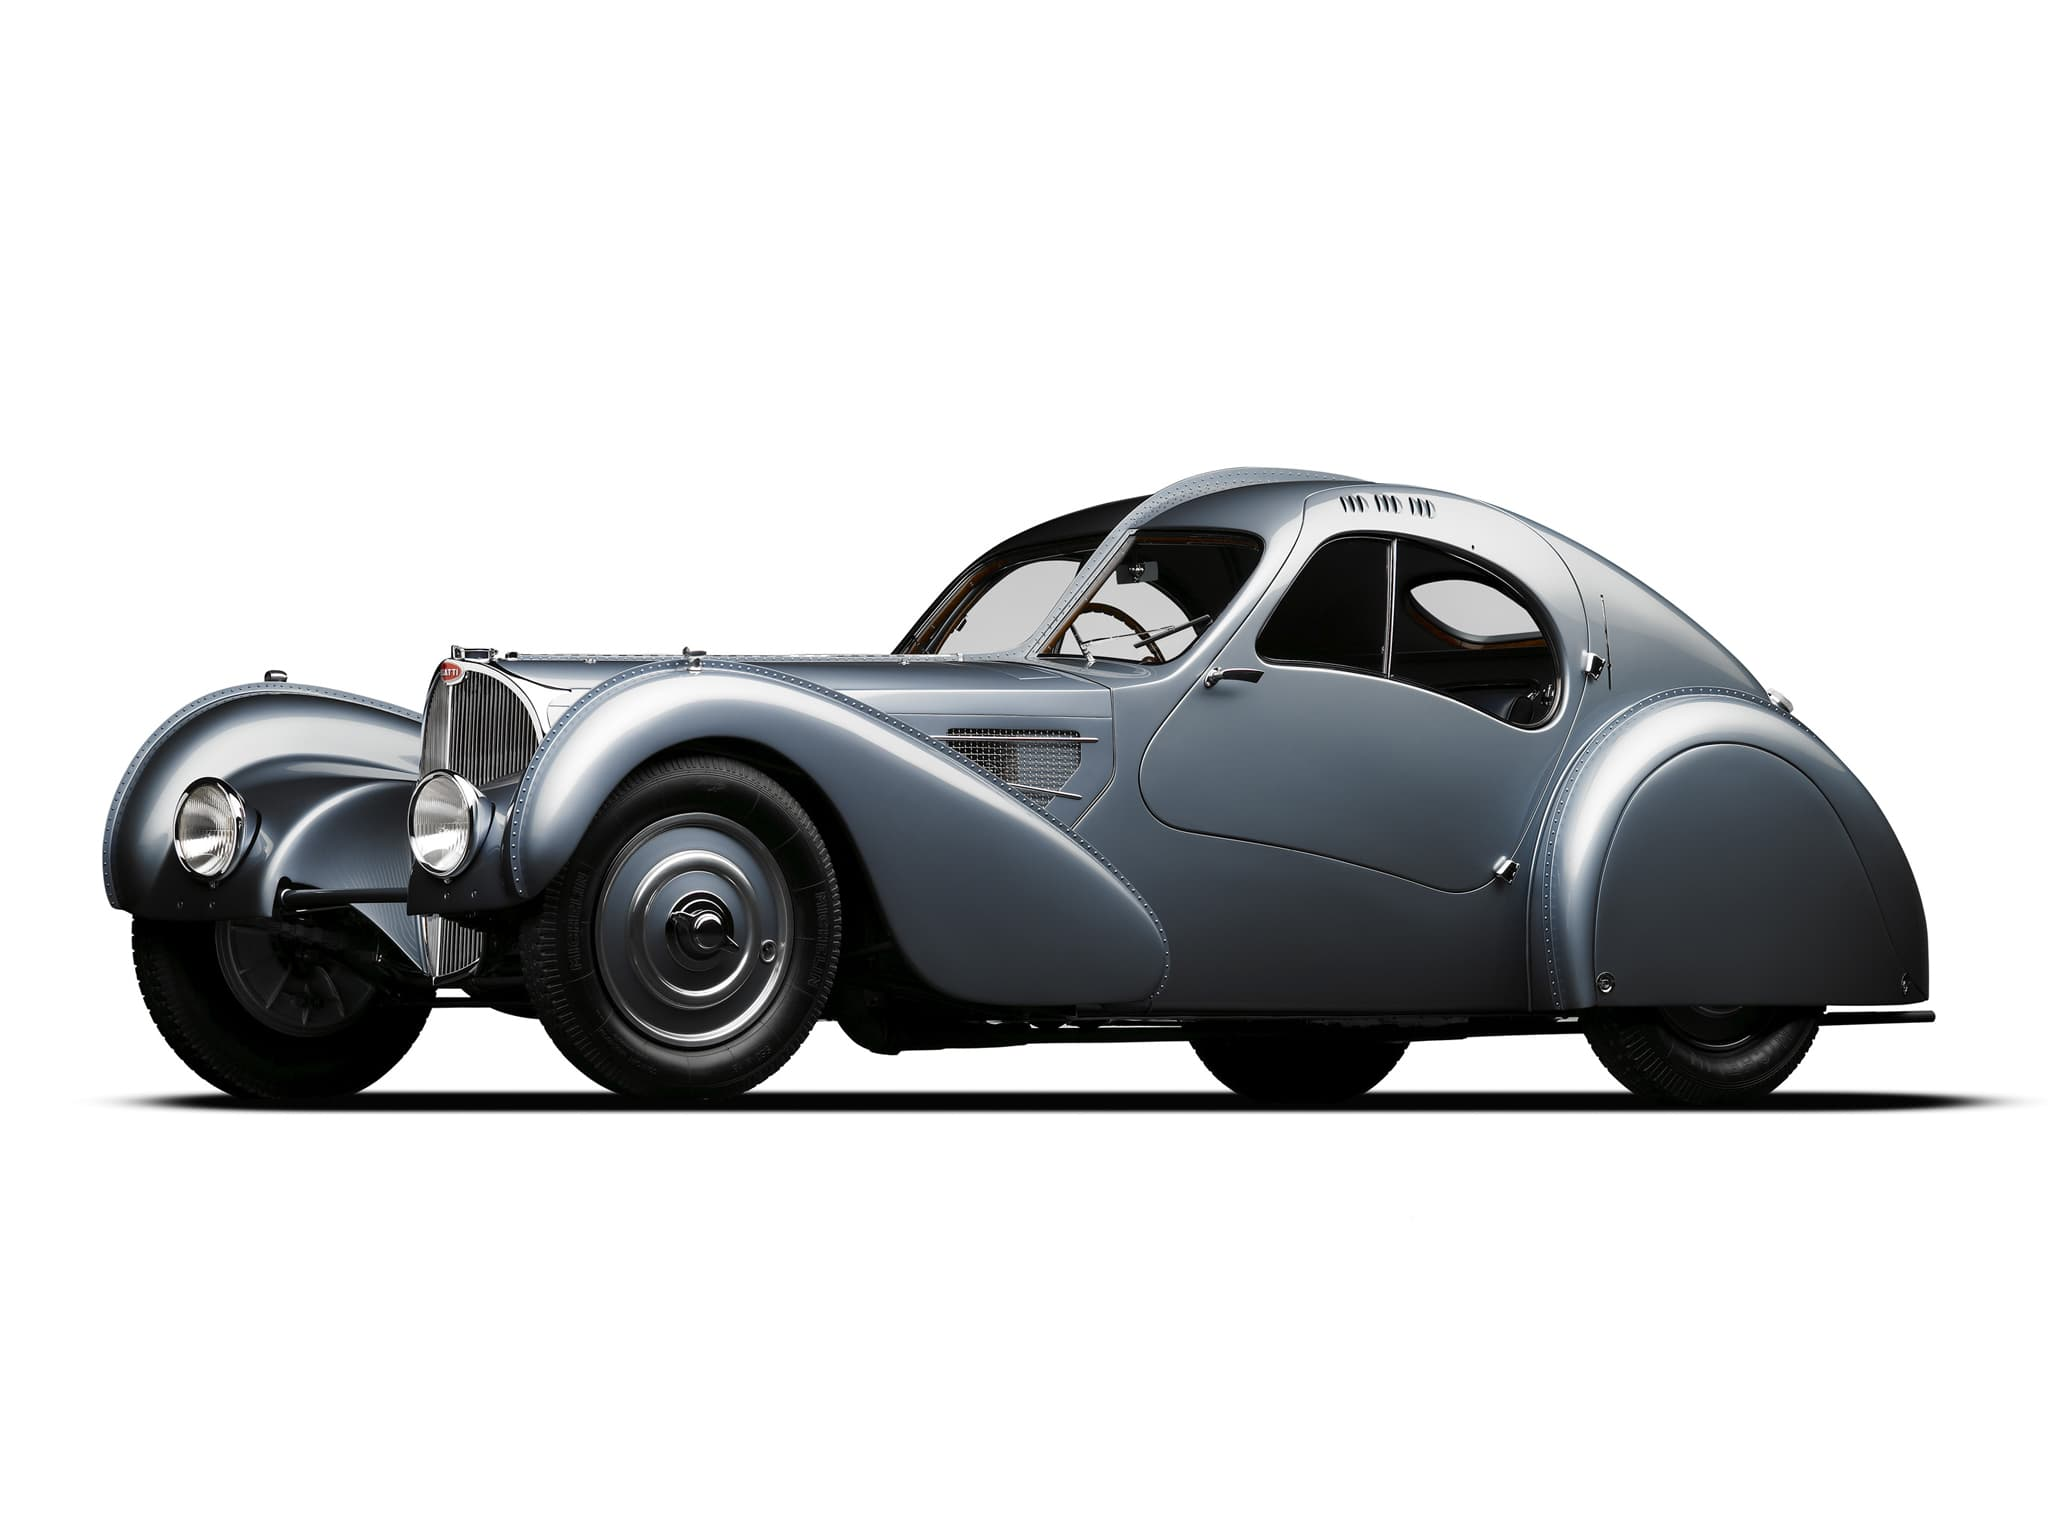 3_Bugatti-Type-57SC-Atlantic-Coupe.jpg